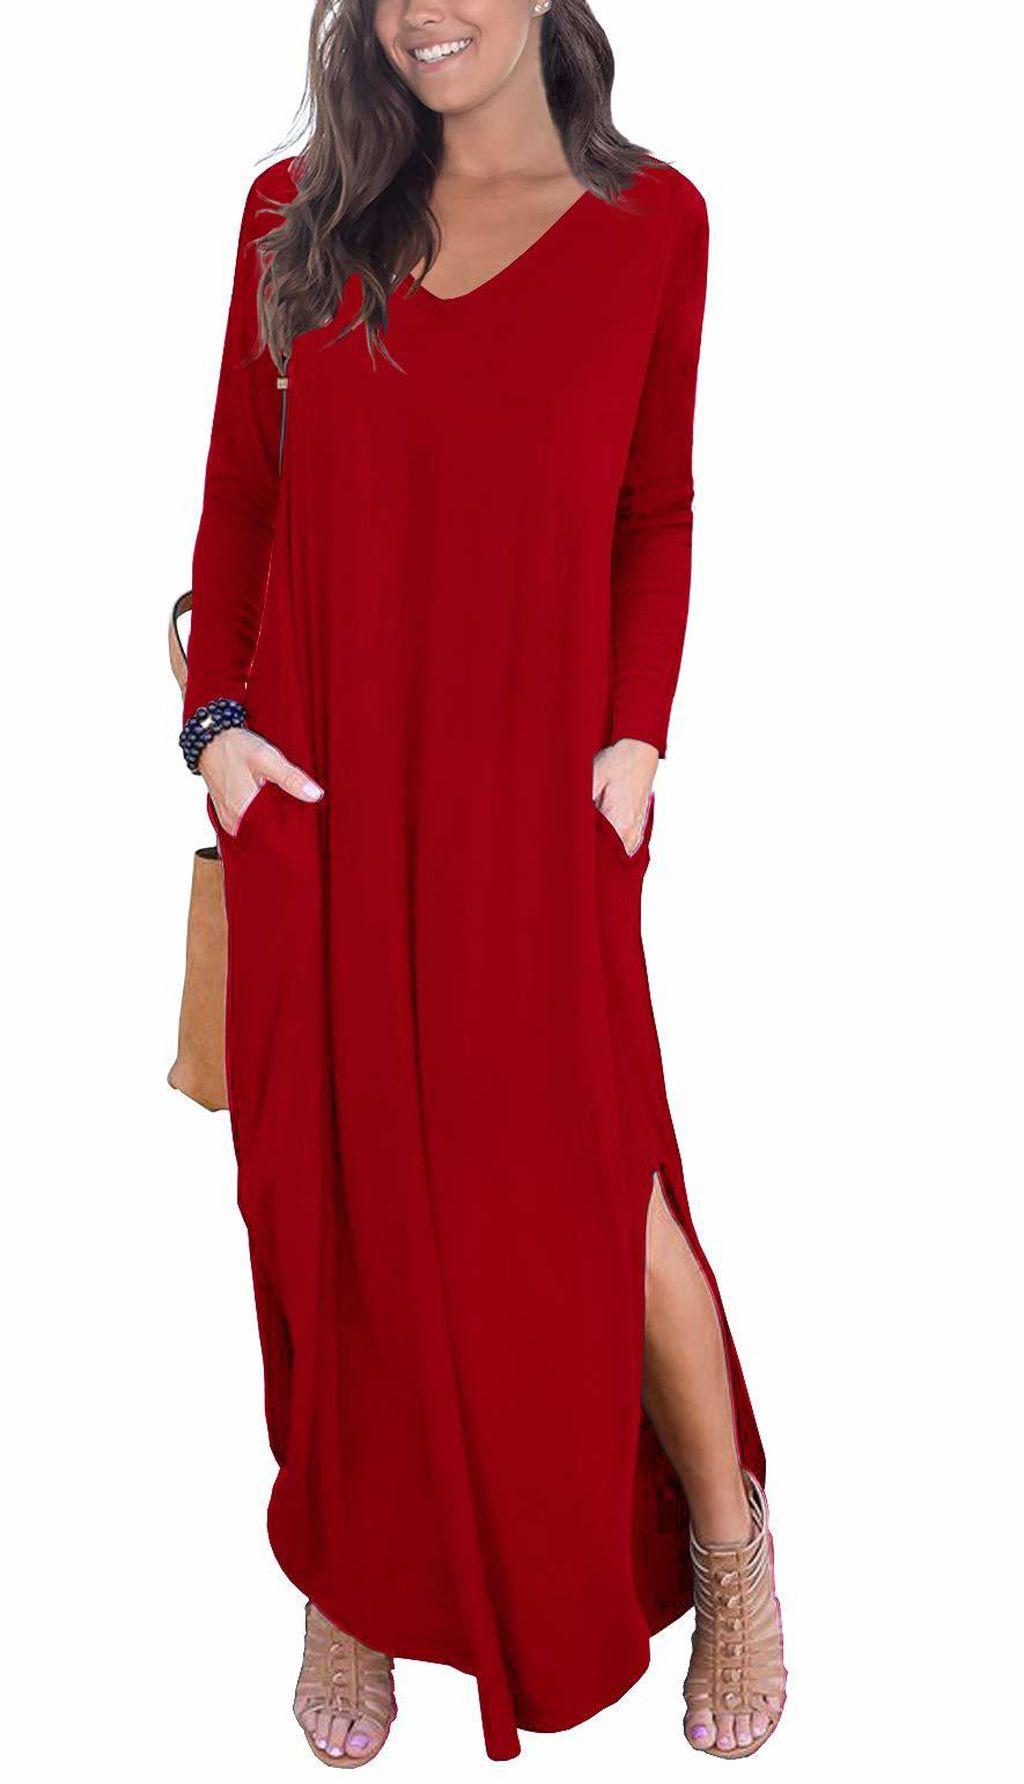 Grecerelle maksi haljina na Amazonu - 1